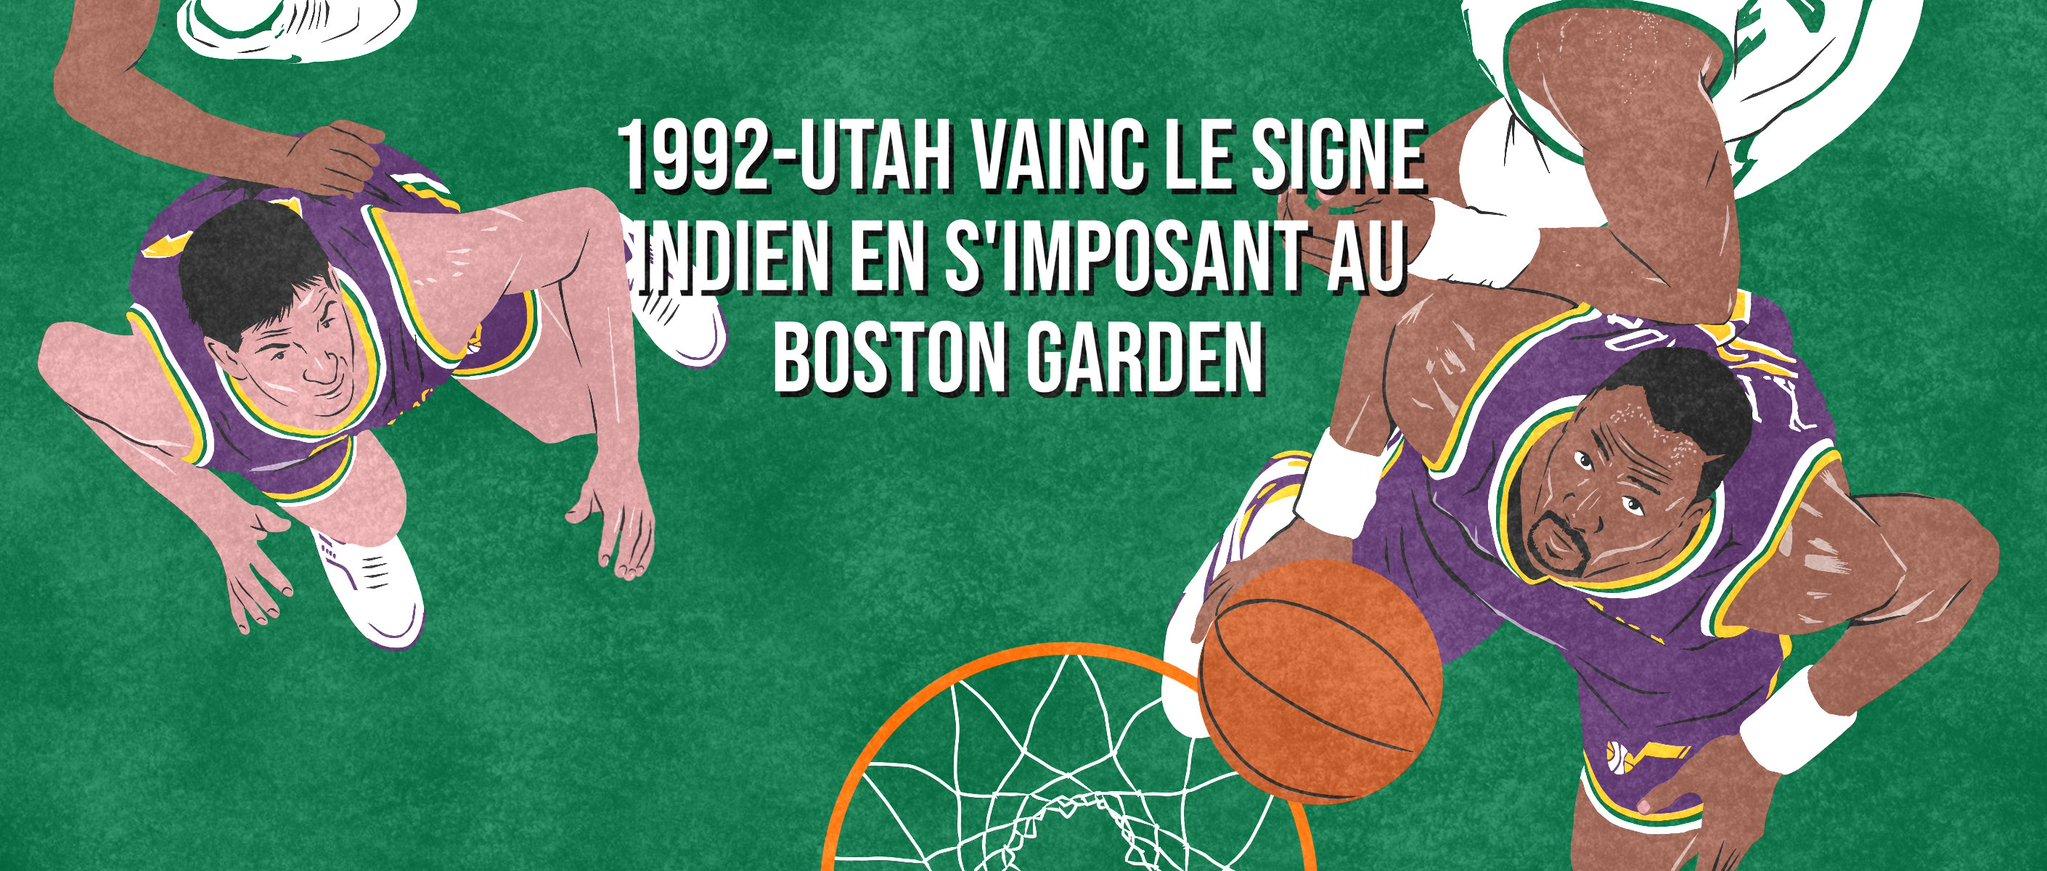 Jazz-Celtics AdrienPMMP